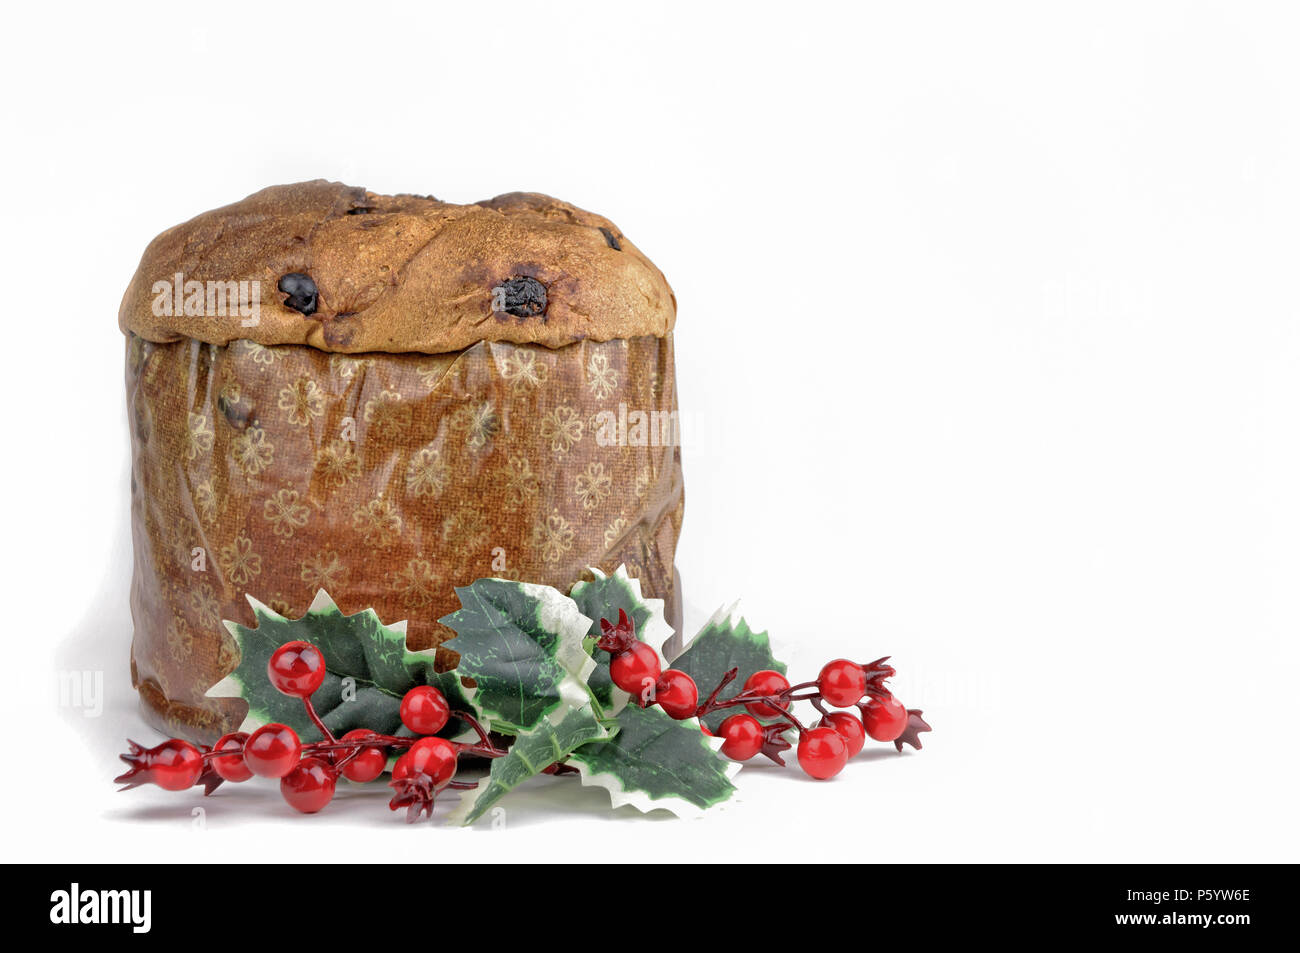 Italian Christmas Decorations Stock Photos & Italian Christmas ...